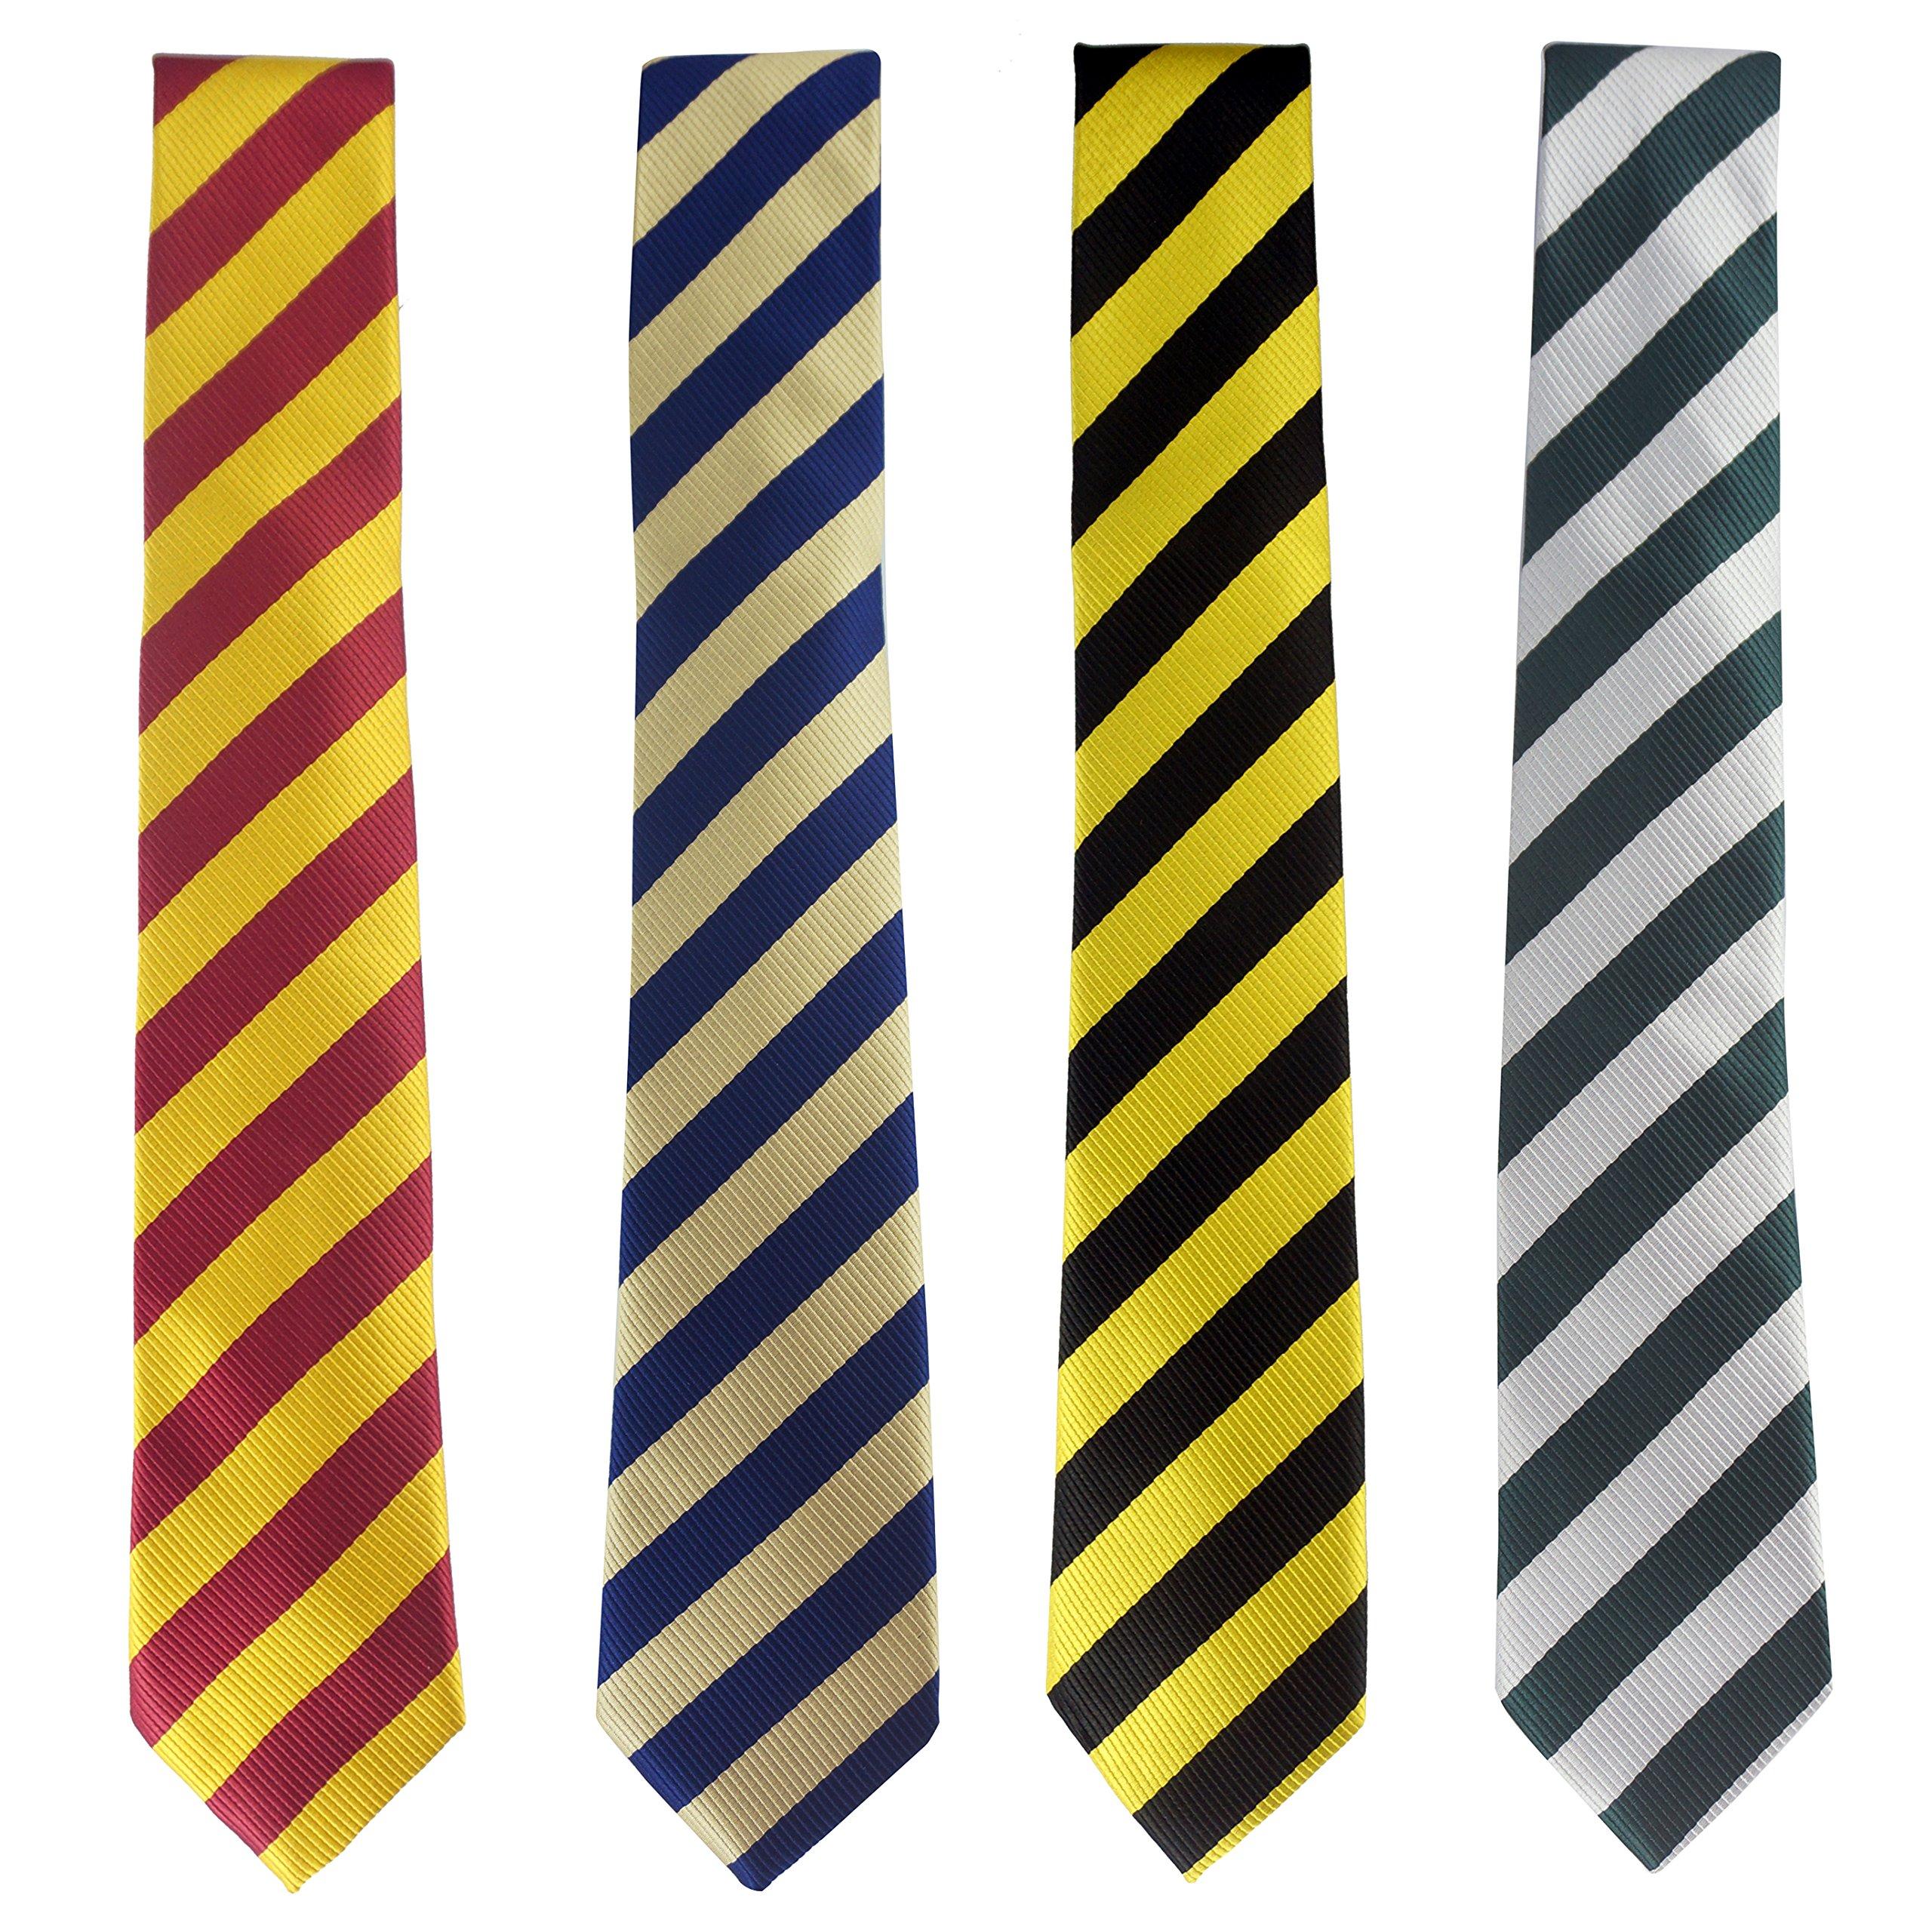 LilMents 4 Pack Pinstriped Formal Necktie Tie Set (Multicolored Set B)